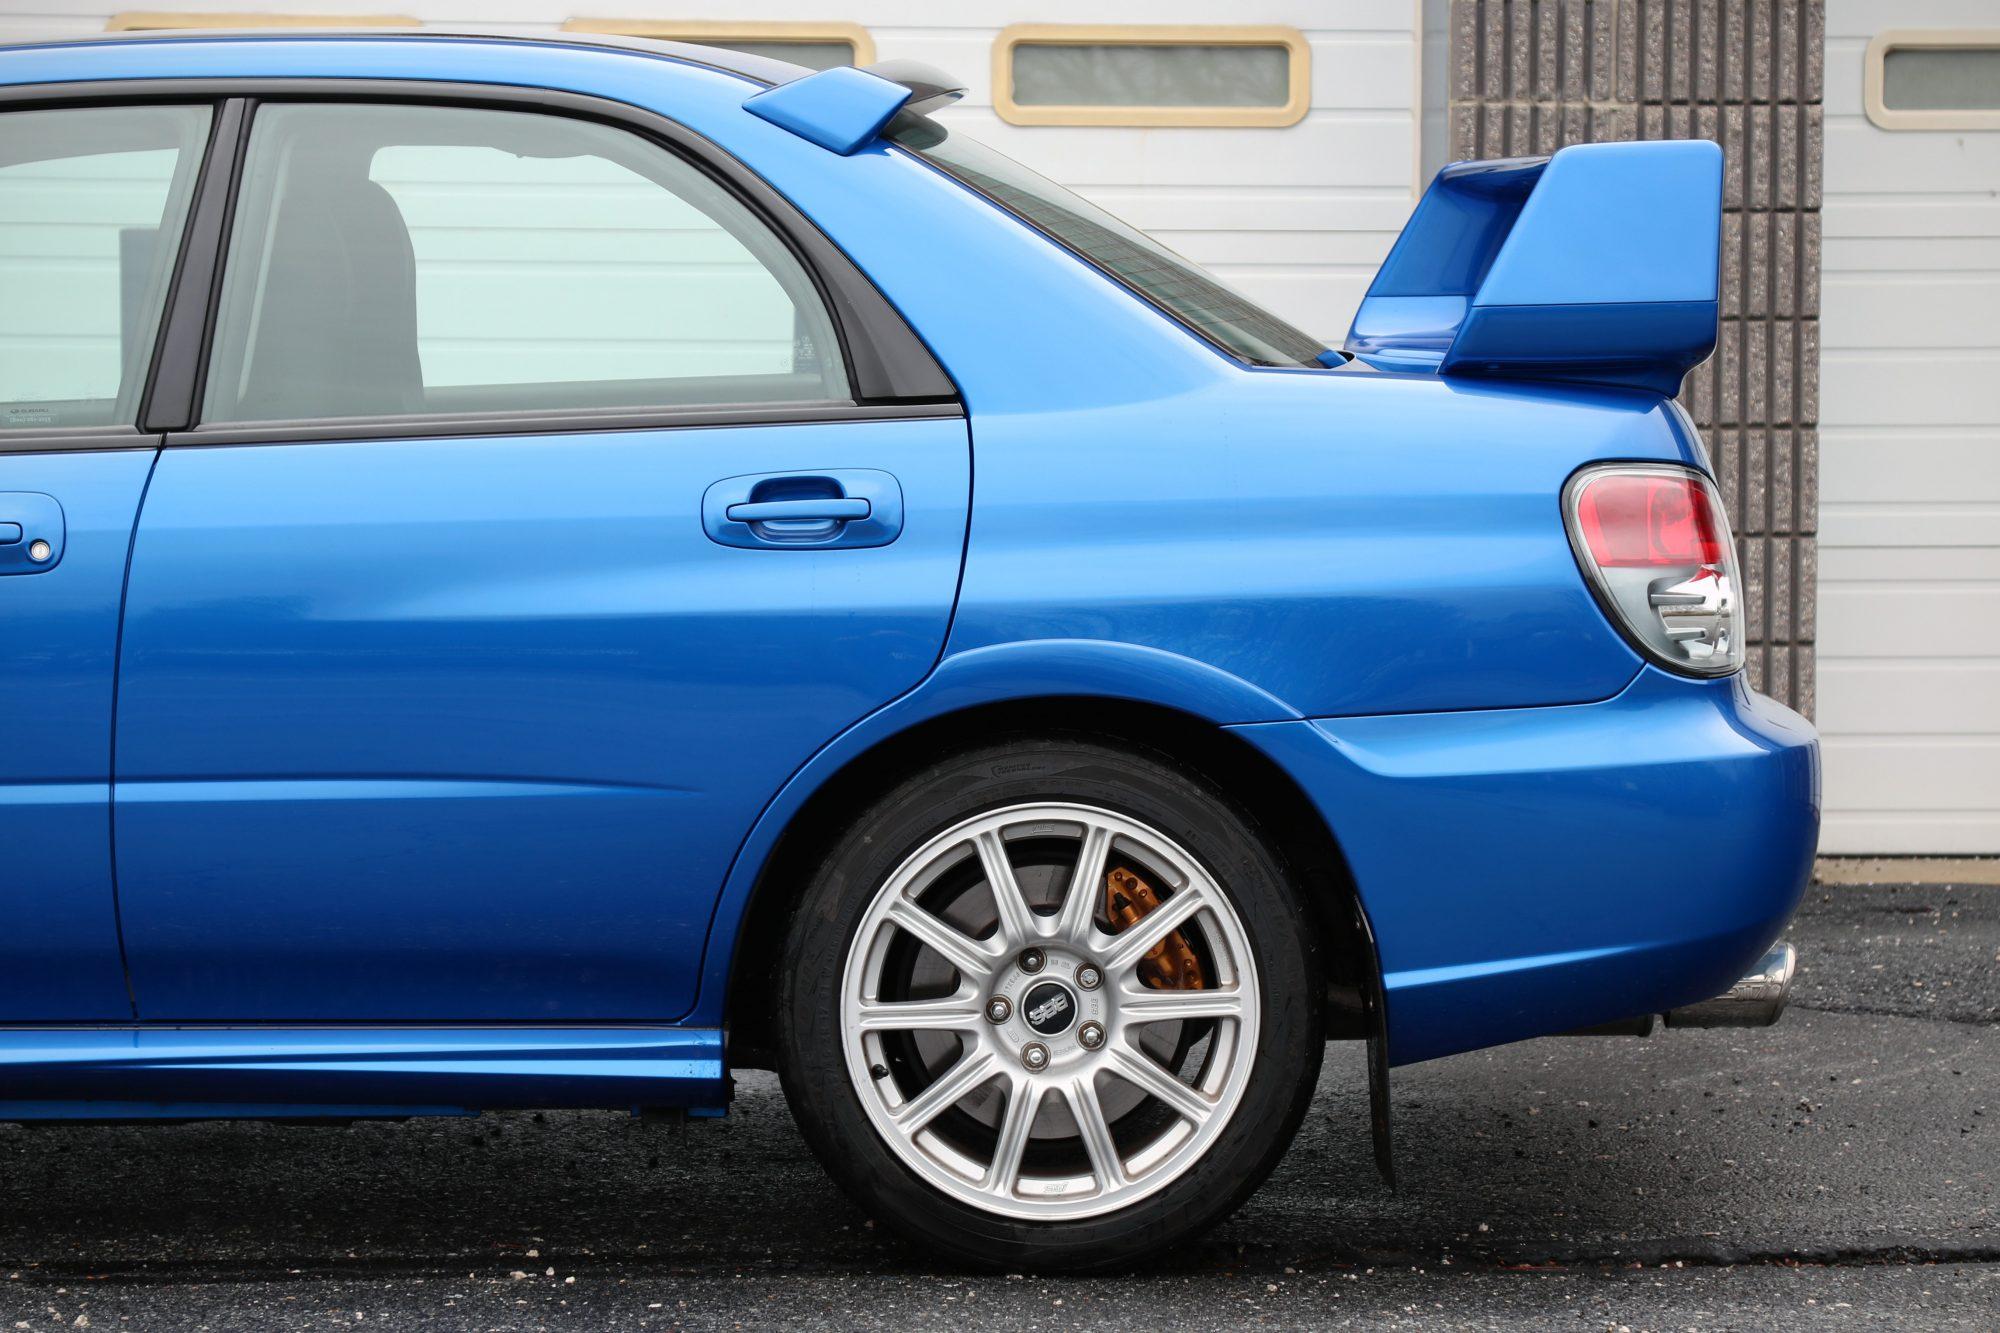 2005 2007 Subaru Wrx Sti Rear Lh Quarter Panel Fender Flare Driver Side Oem Fhi Painted Subieautoparts Com